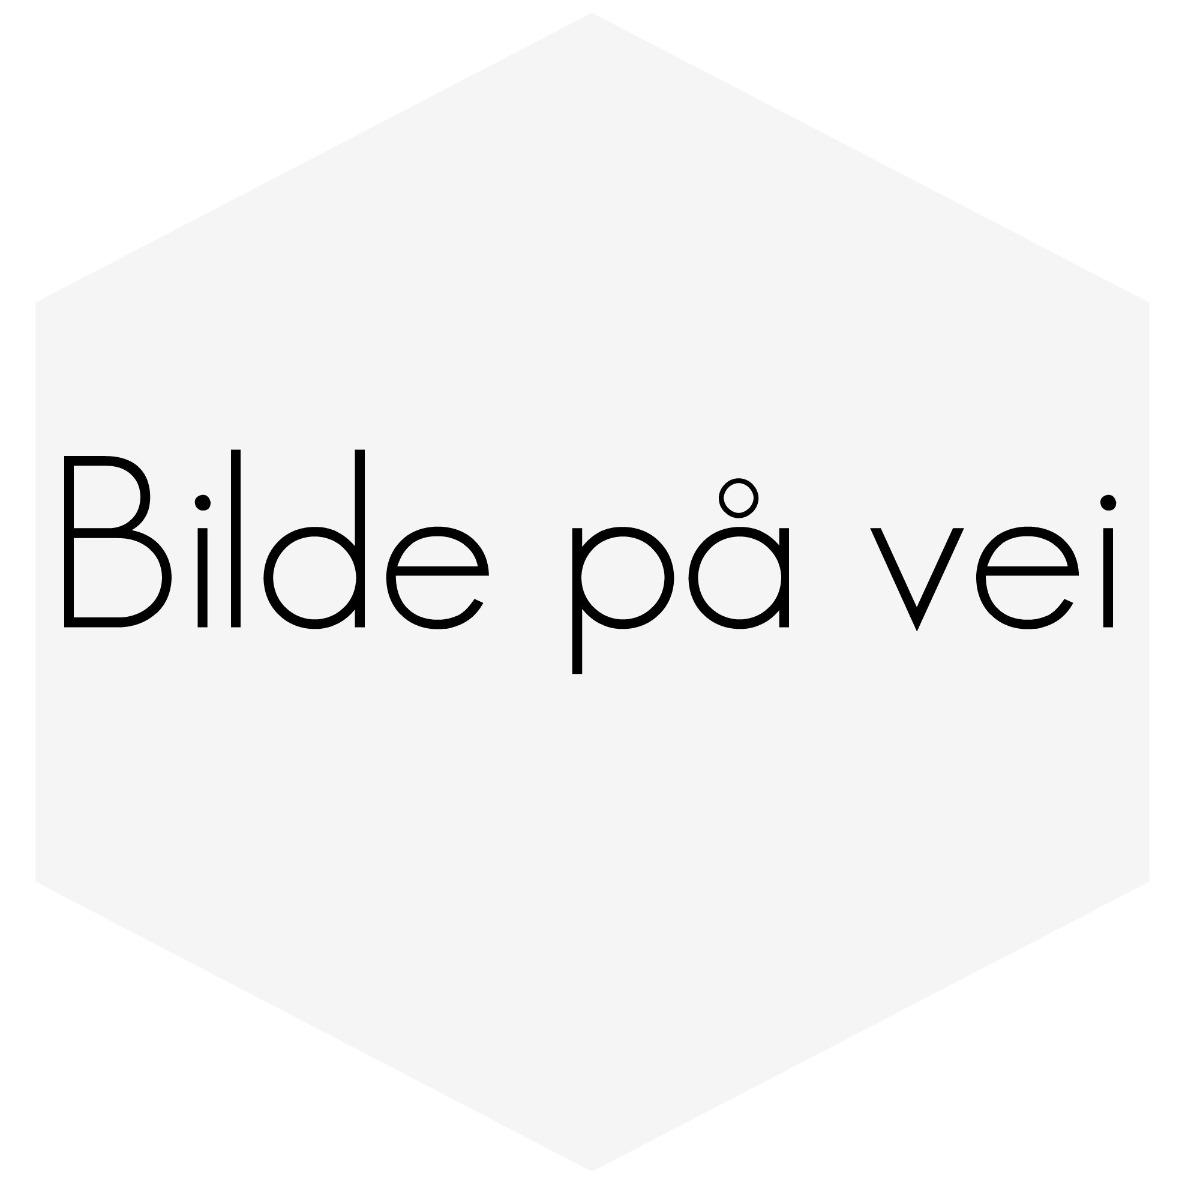 STOL RYGGSIDE STØTTE TIL DIV SPARCO STOLER RØD